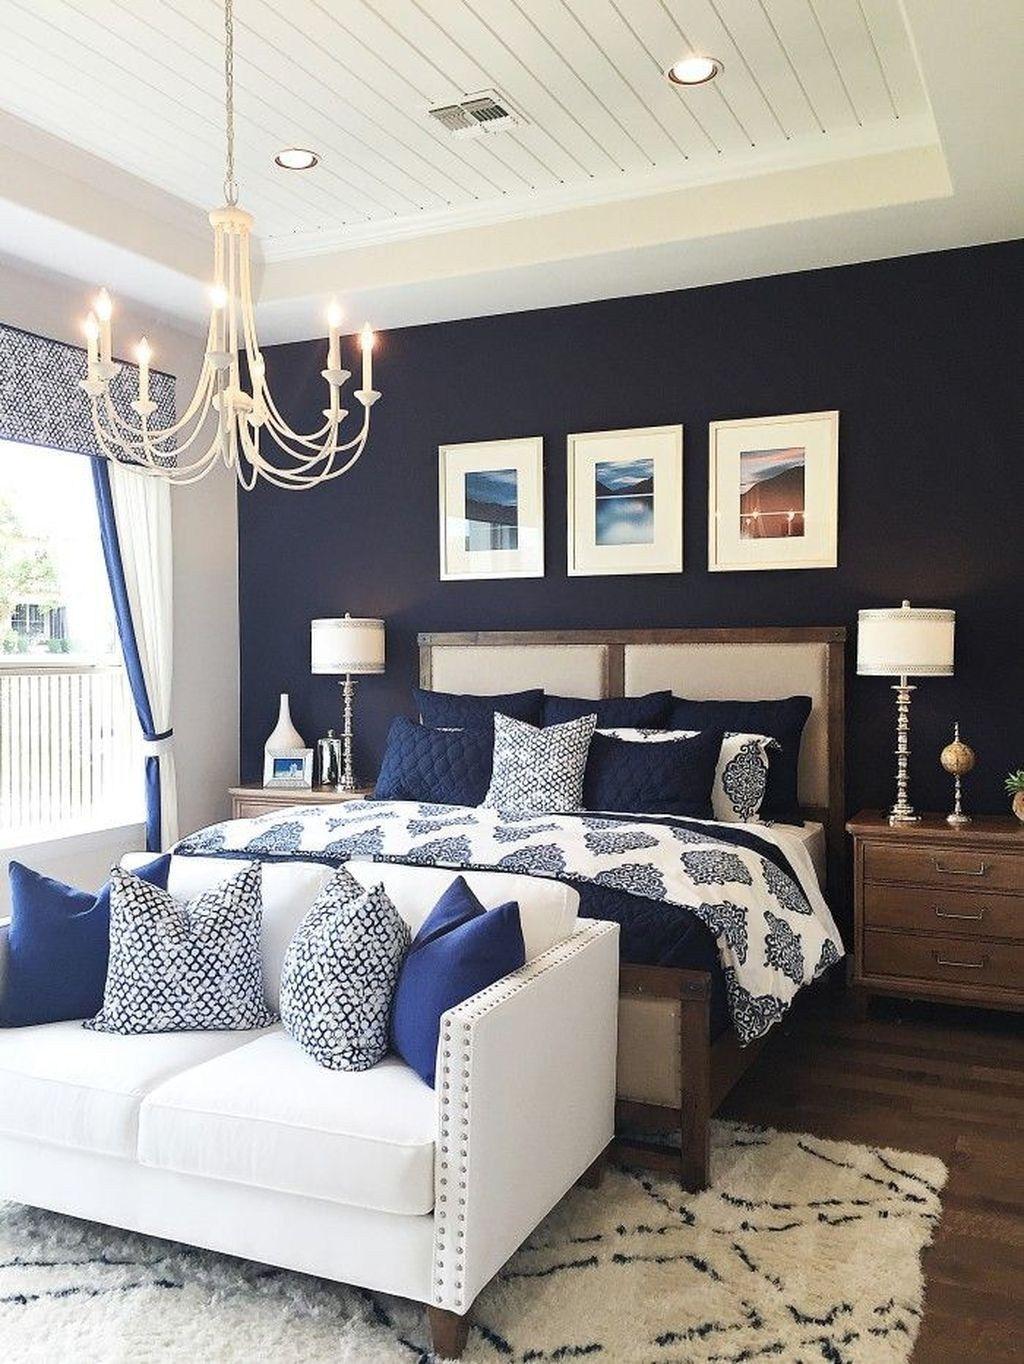 Brilliant Small Master Bedroom Ideas29